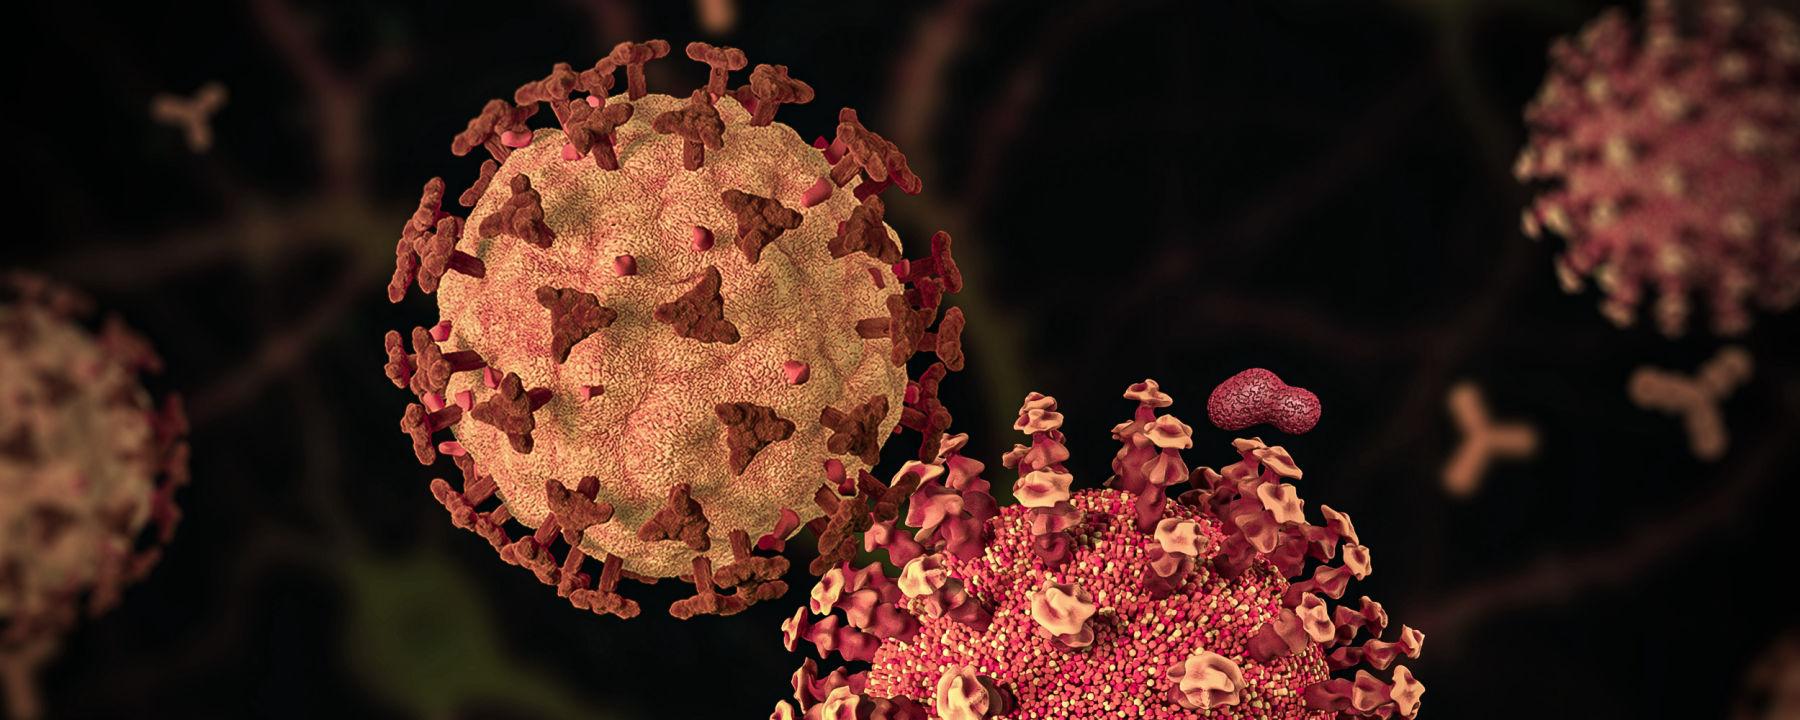 Decoy Cells Trick SARS-CoV-2, Reduce Cytokines In Vitro